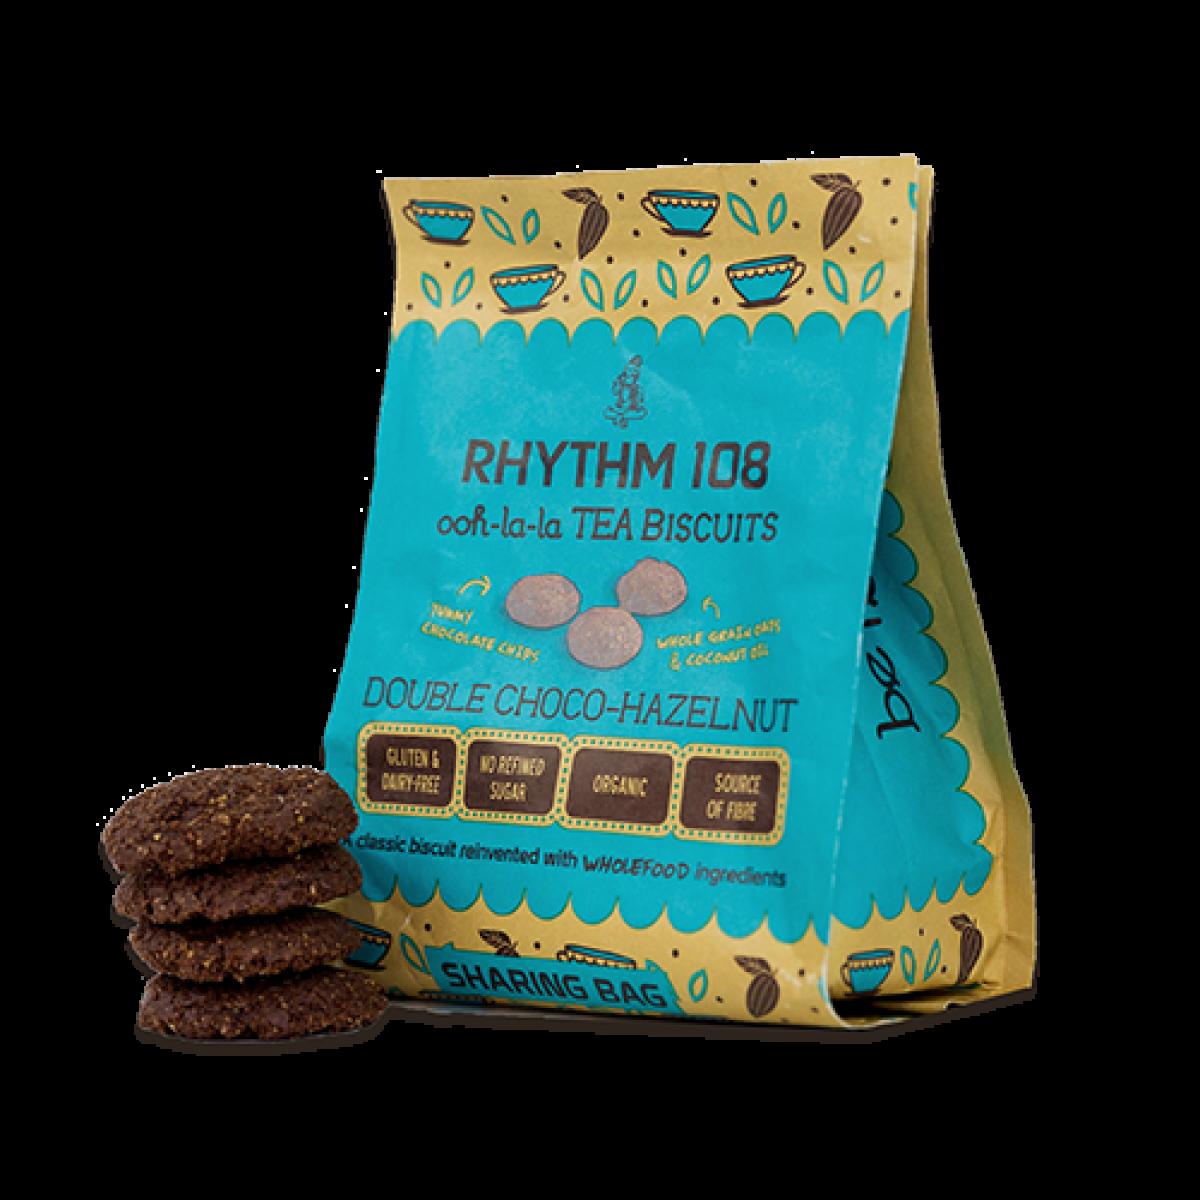 Double Choco Hazelnut Biscuits